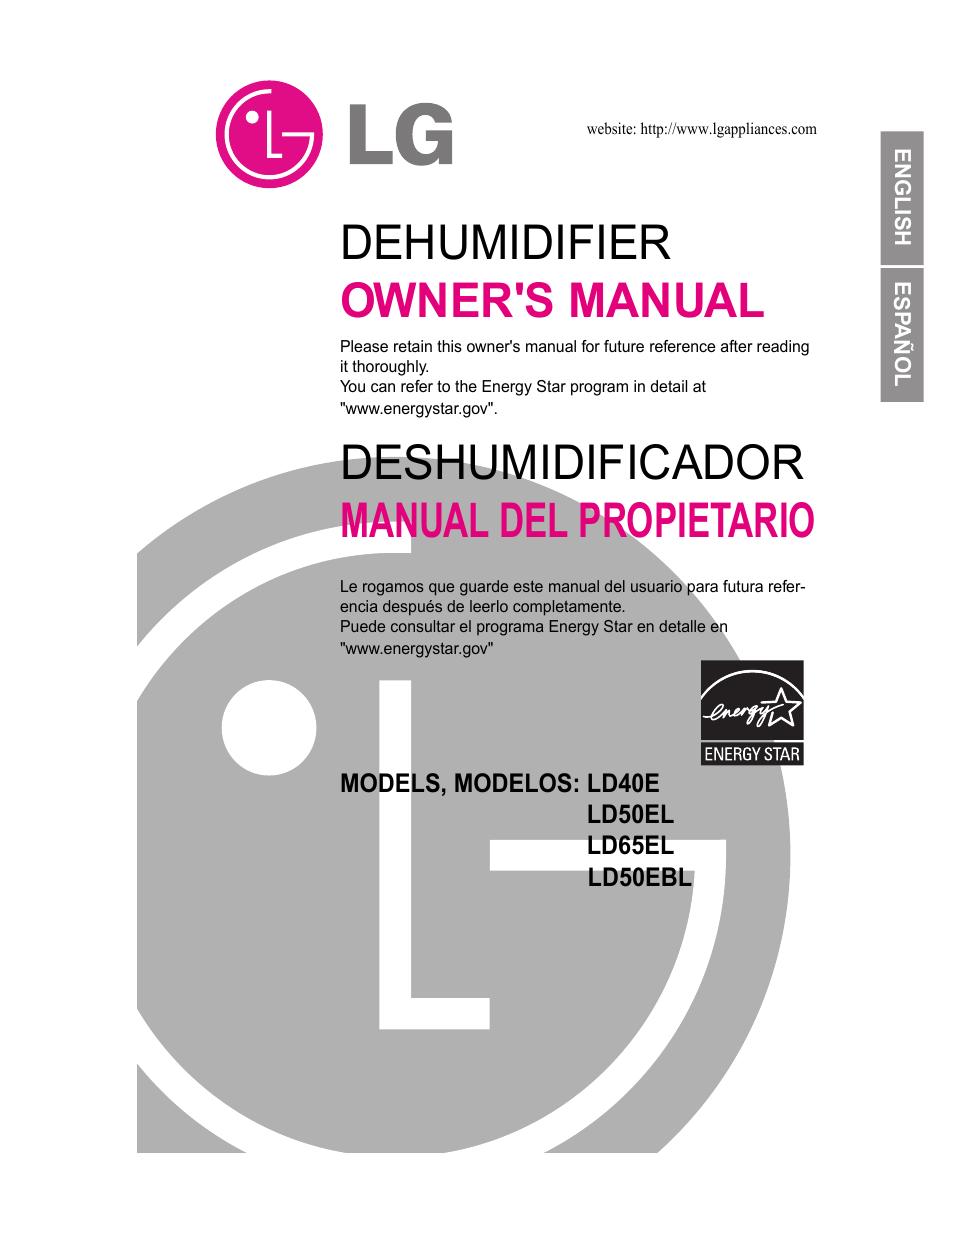 lg ld40e user manual 31 pages original mode rh manualsdir com LG Dehumidifier Recall Model Numbers LG LHD659EBL Appliances Dehumidifiers Manuals